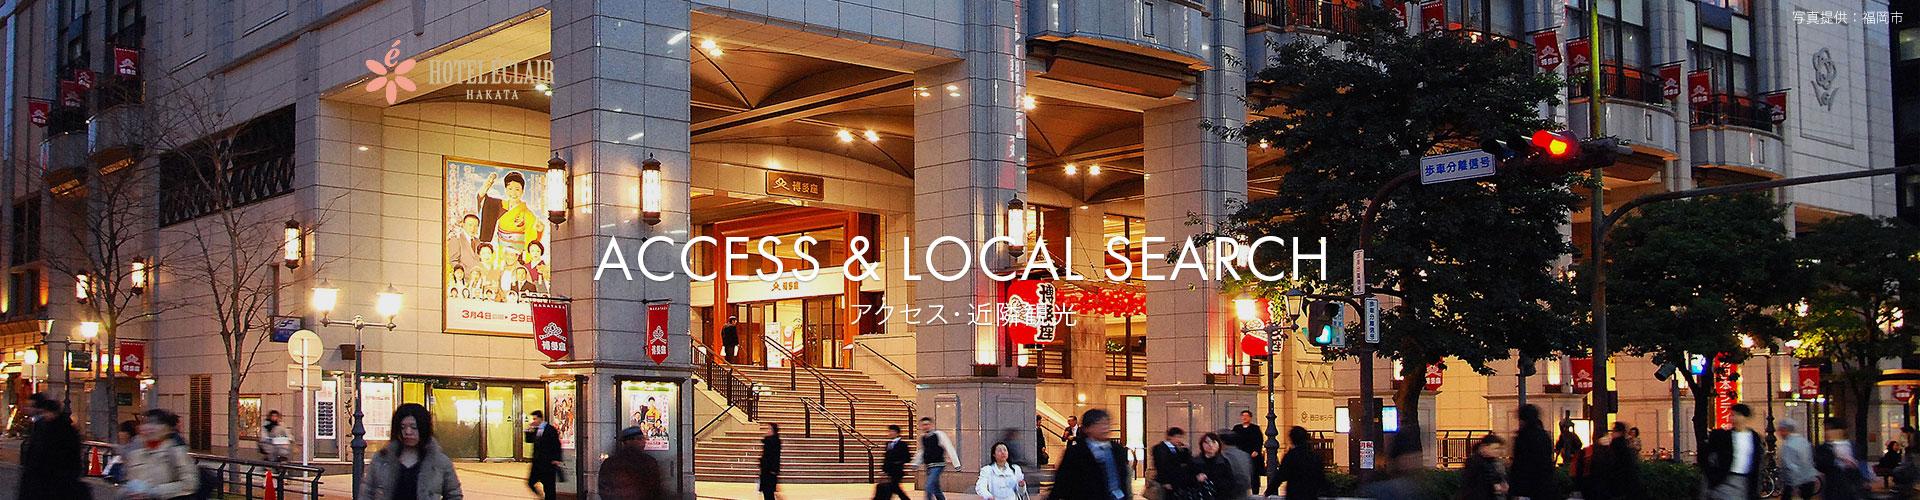 ACCESS & LOCAL SEARCH アクセス・近隣観光